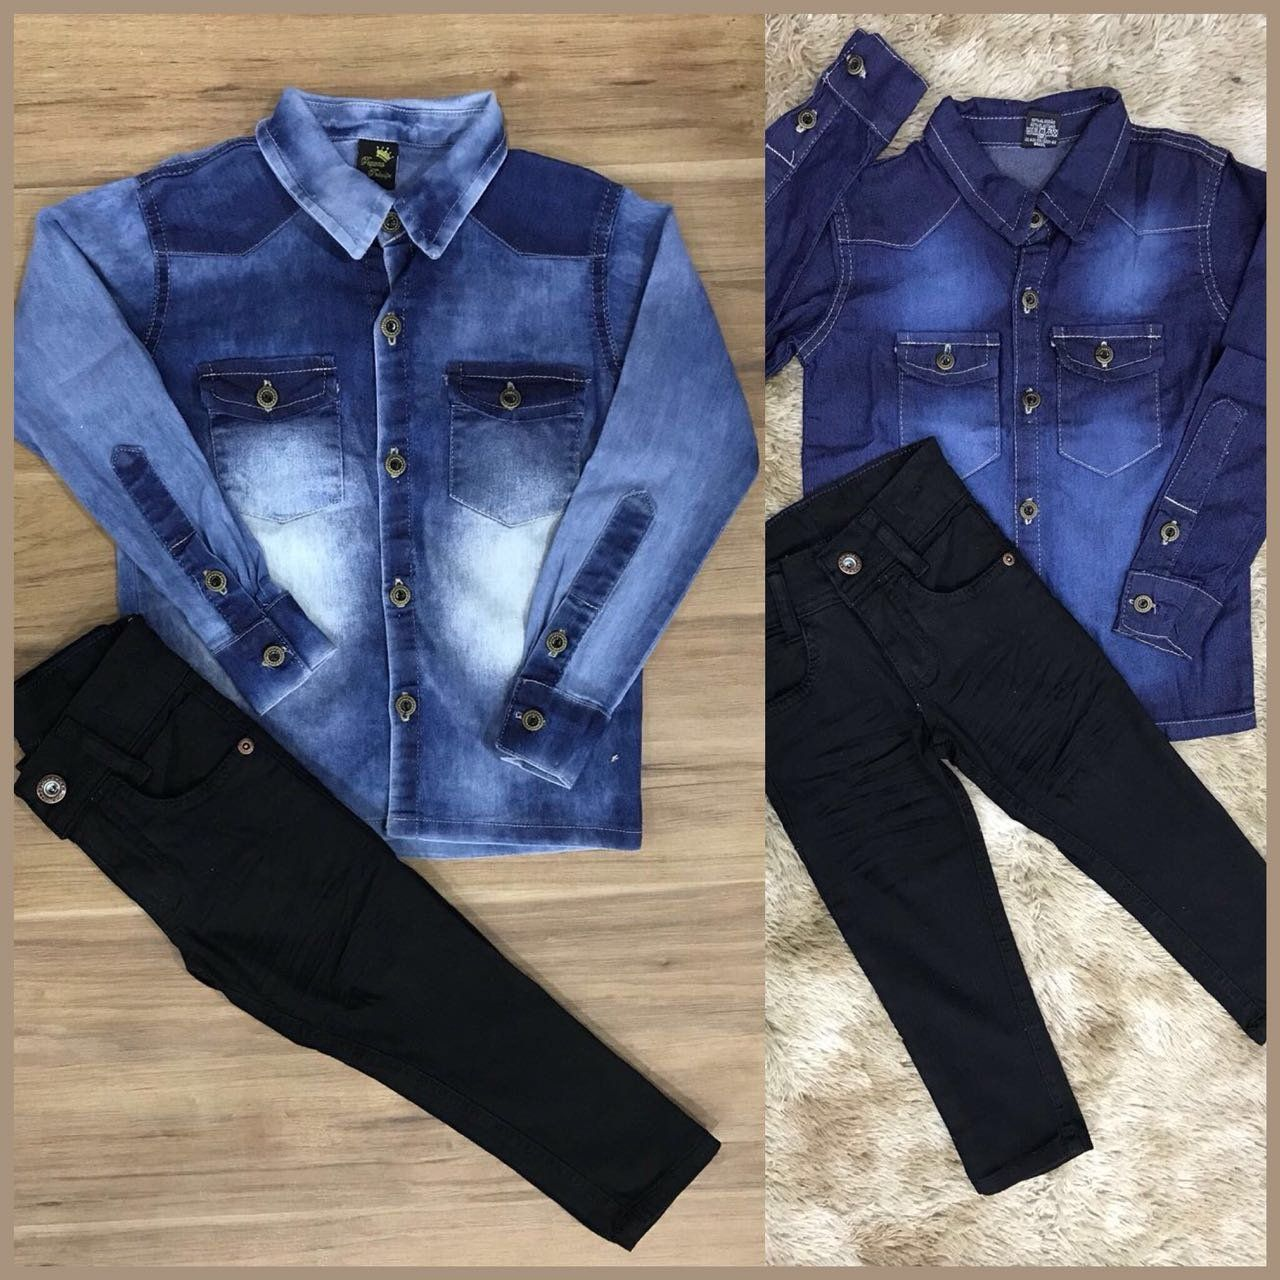 Calça Preta com Camisa Jeans Manga Longa